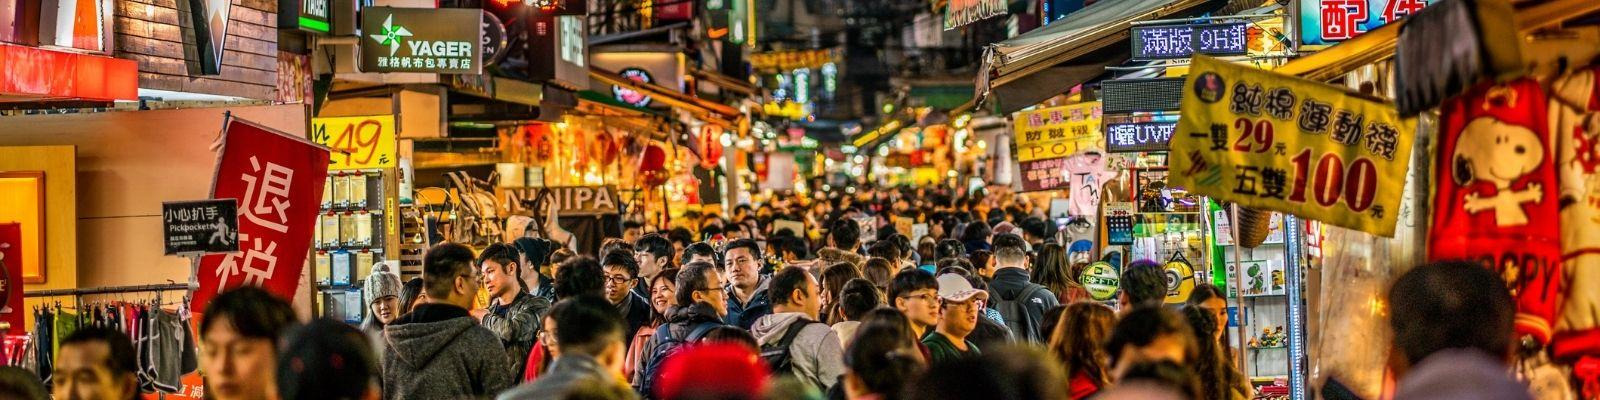 4 Must-Visit Night Markets in Taipei